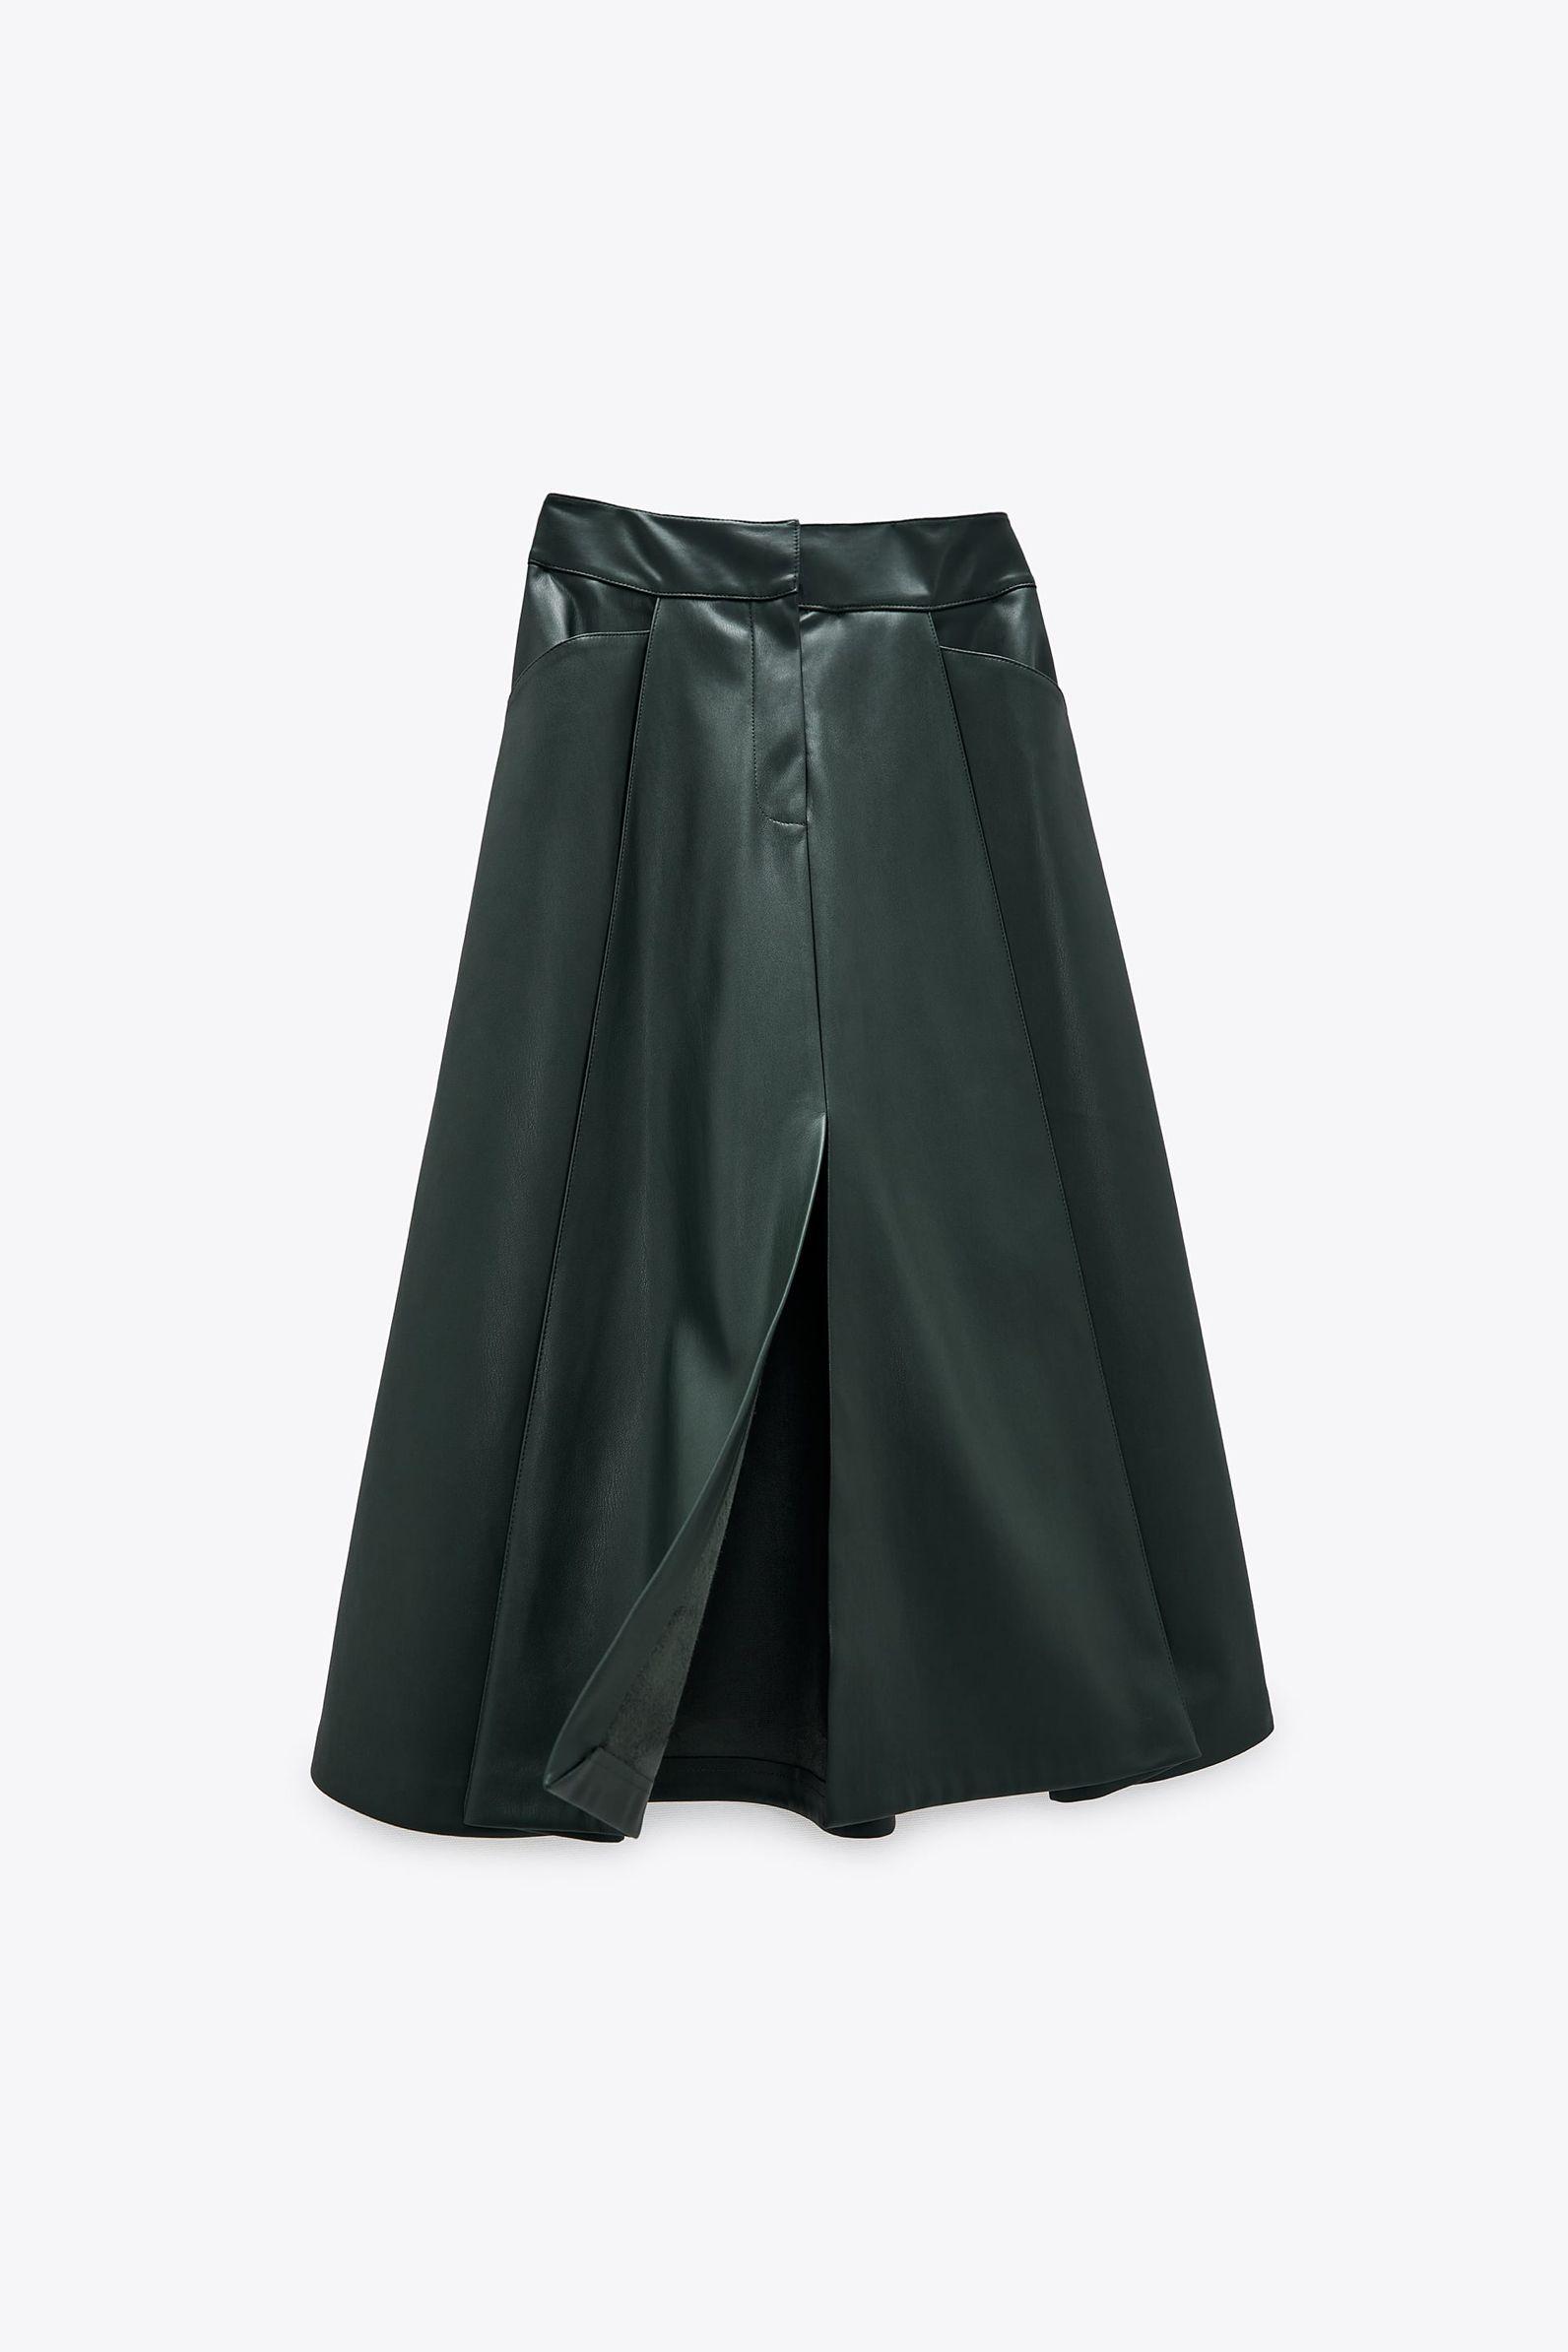 Pin By Noura On ساعة رملية In 2021 Faux Leather Midi Skirt Leather Midi Skirt Skirts